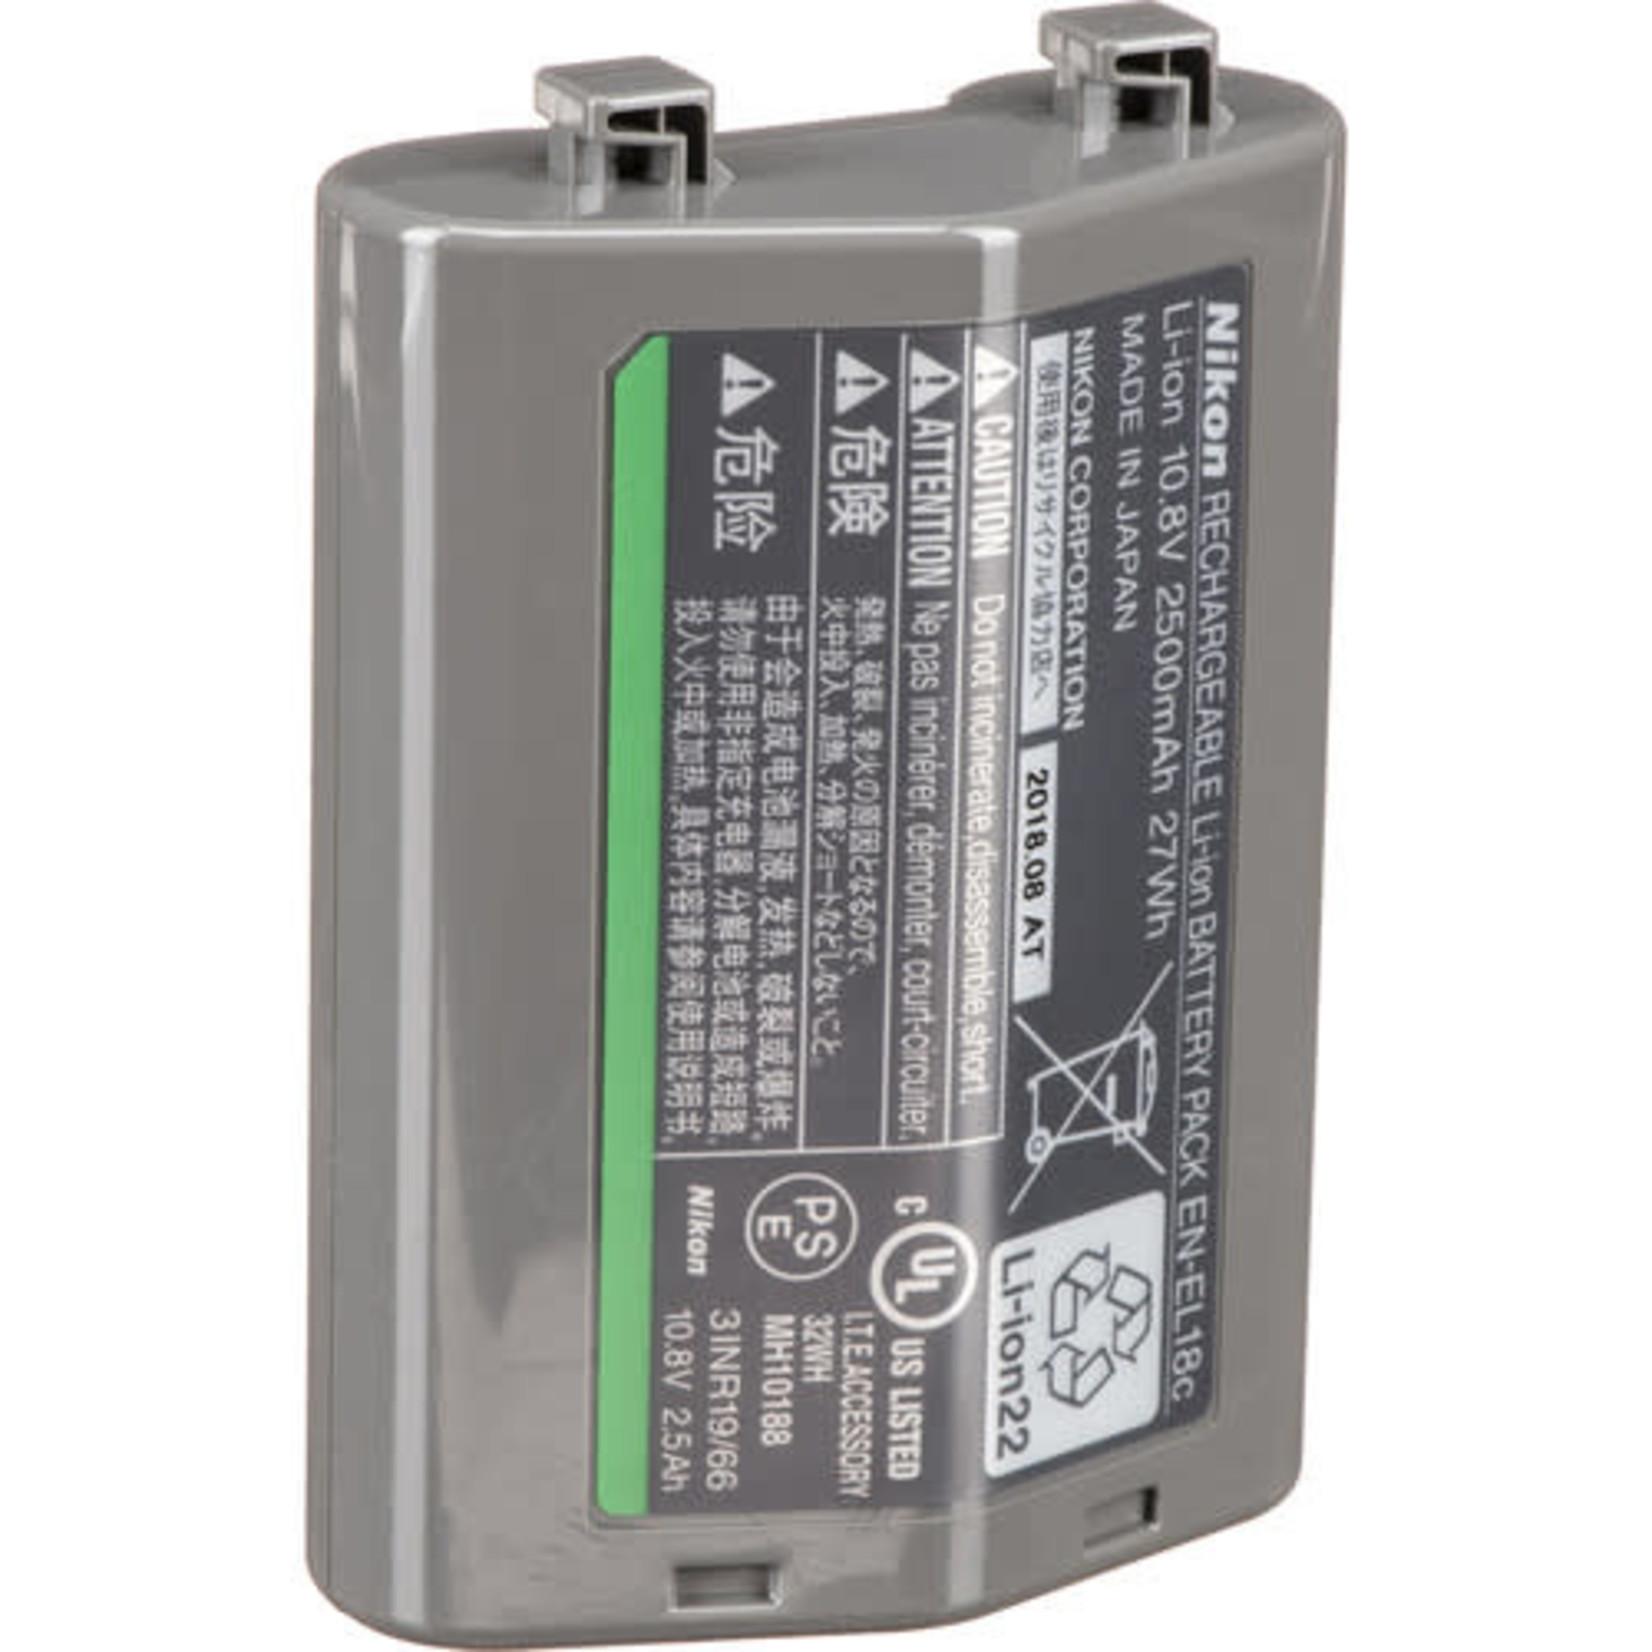 Nikon Nikon EN-EL18c Rechargeable Lithium-Ion Battery (10.8V, 2500mAh)